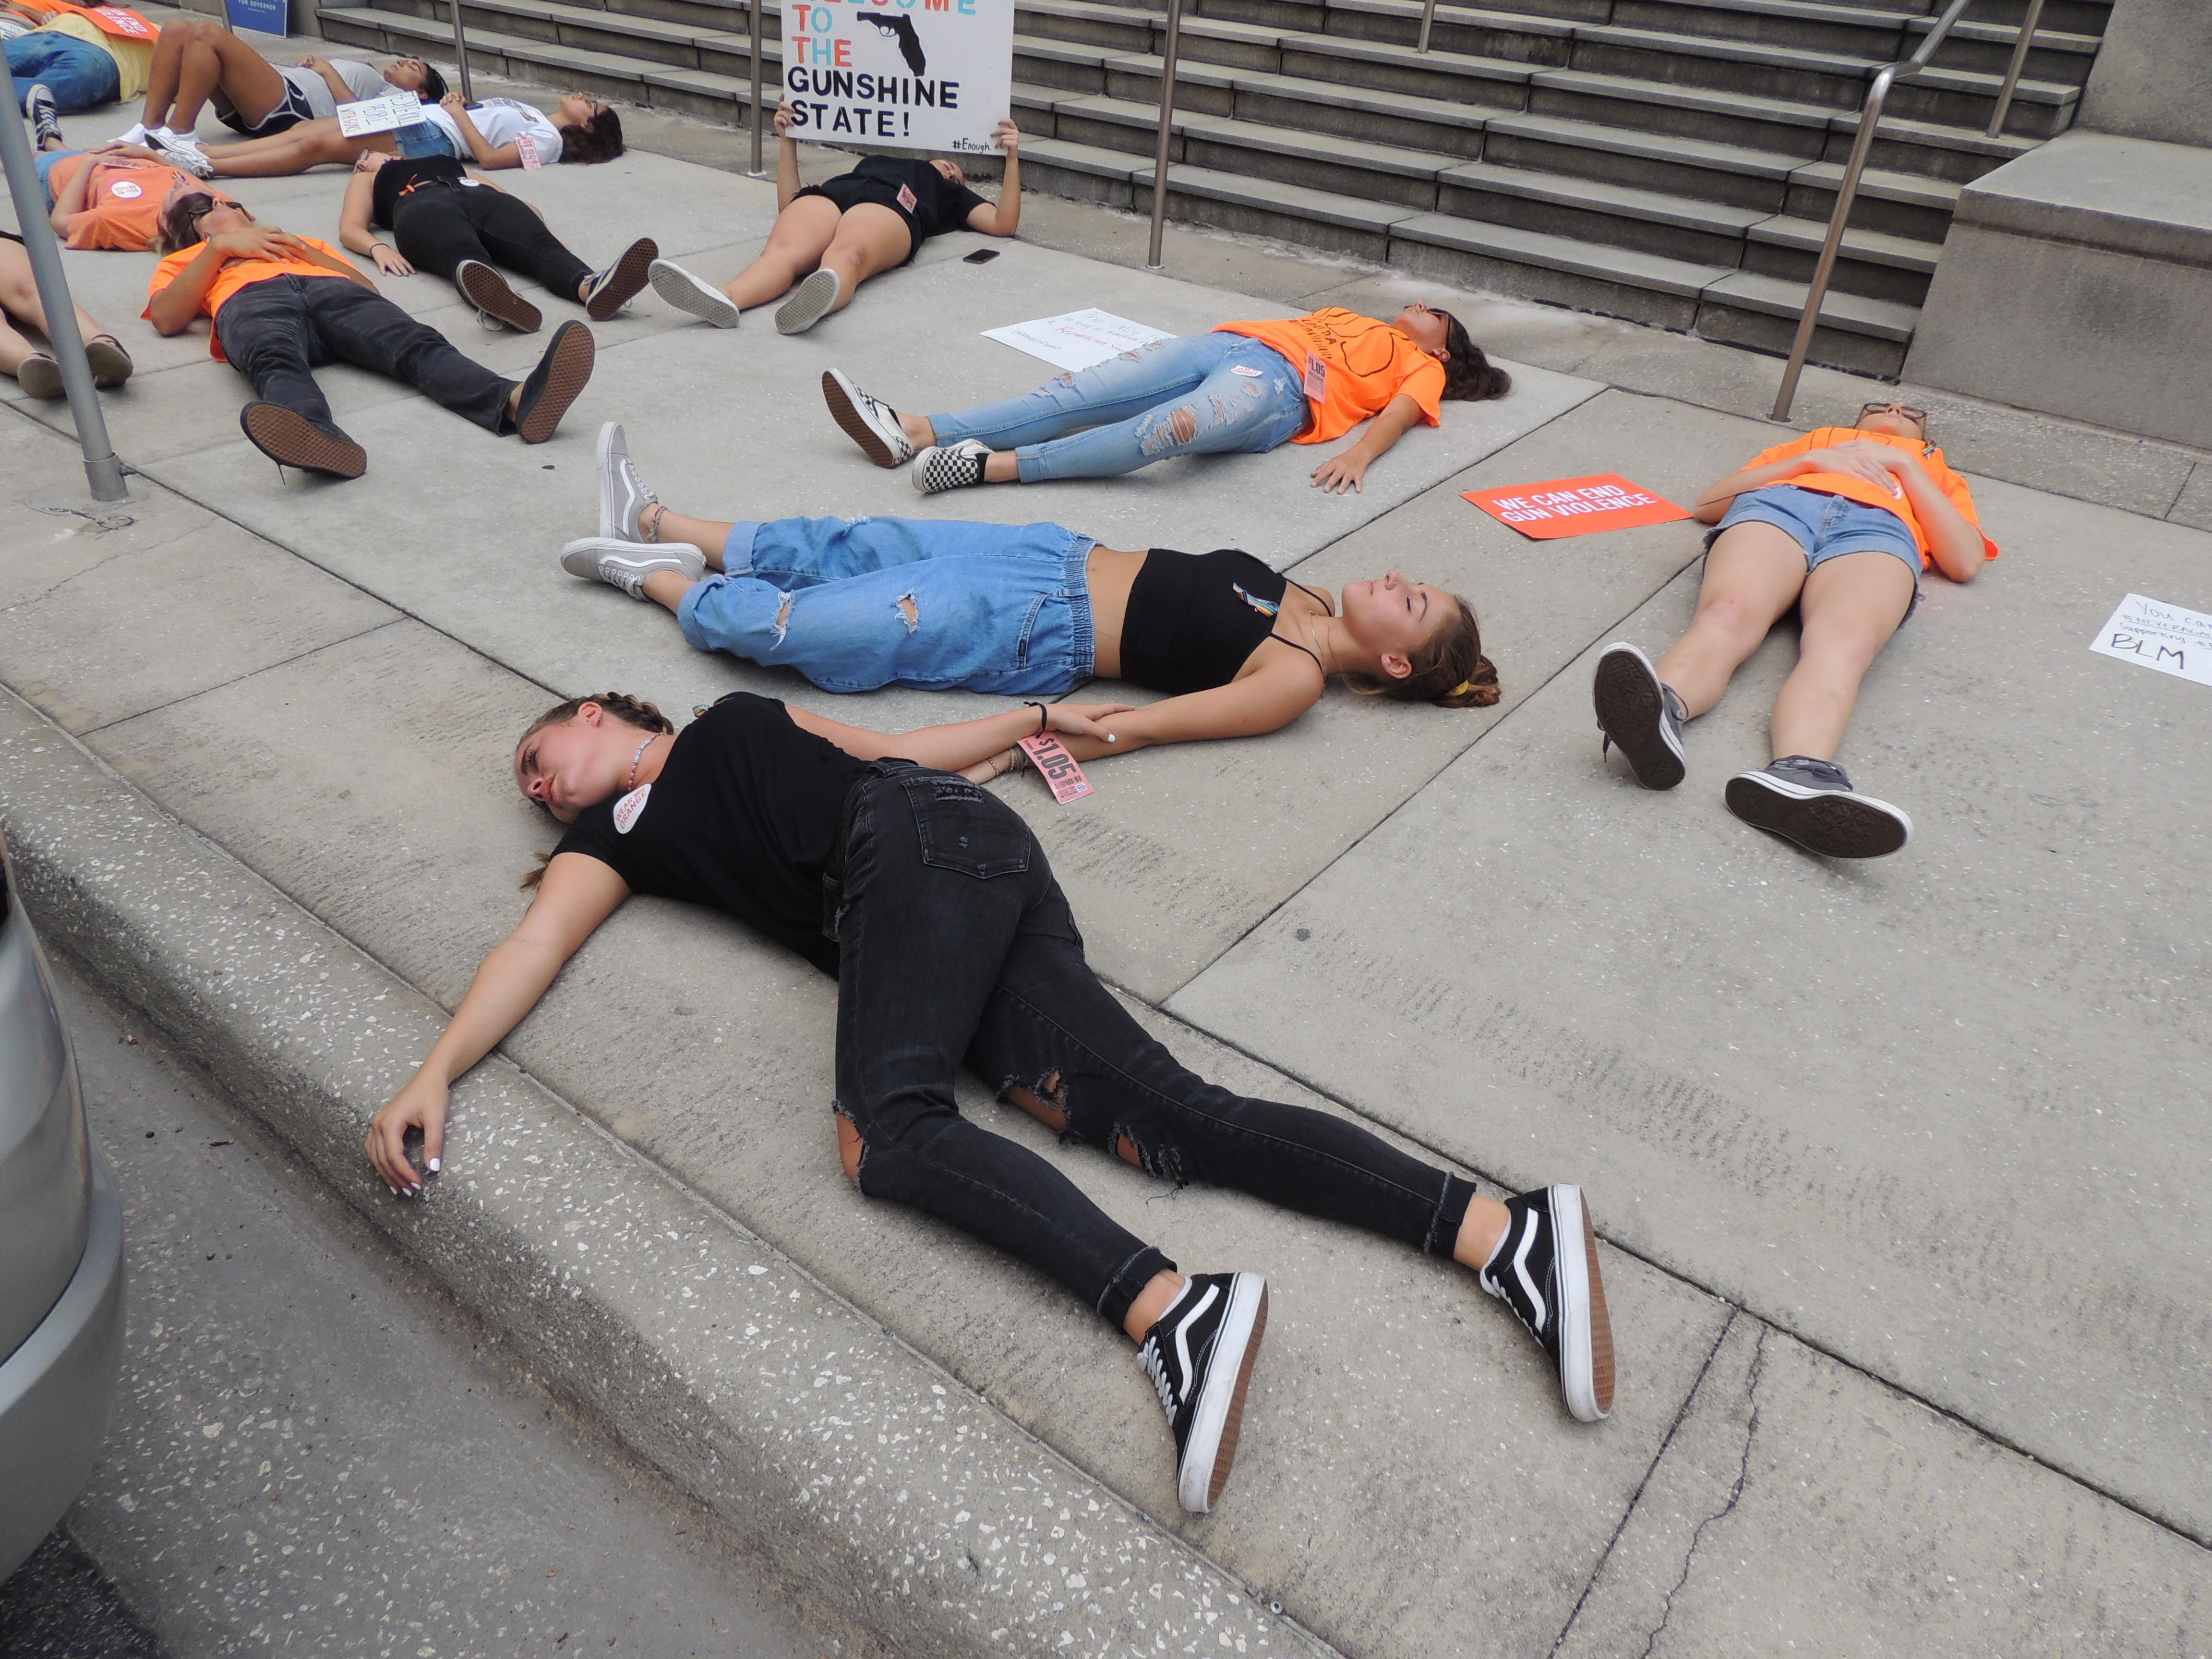 guns gun violence die-in